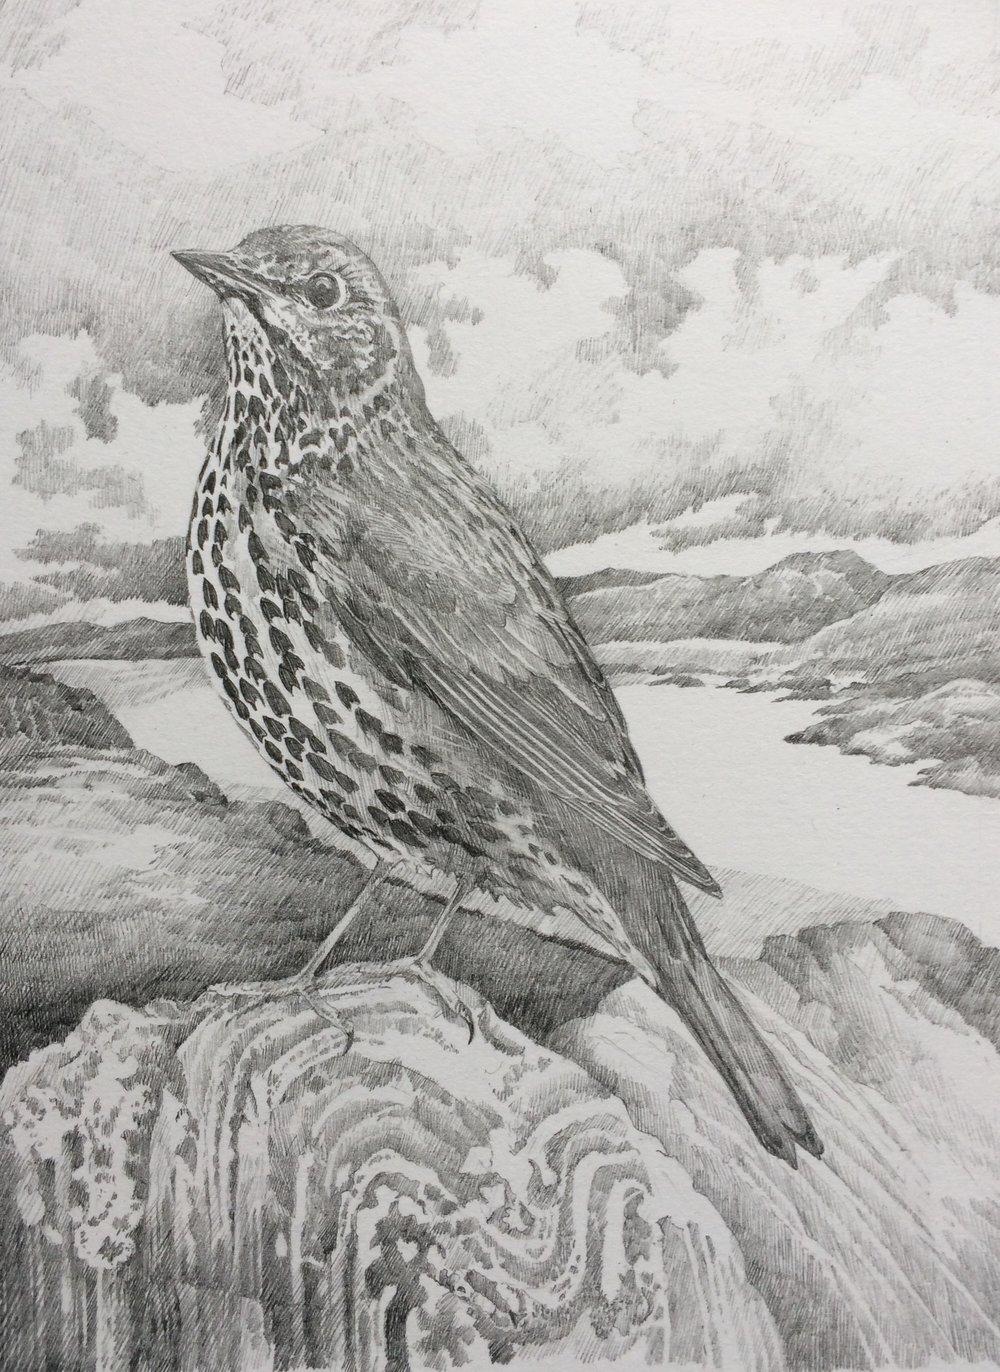 'Hebridean' Thrush  - study from Carinish, North Uist